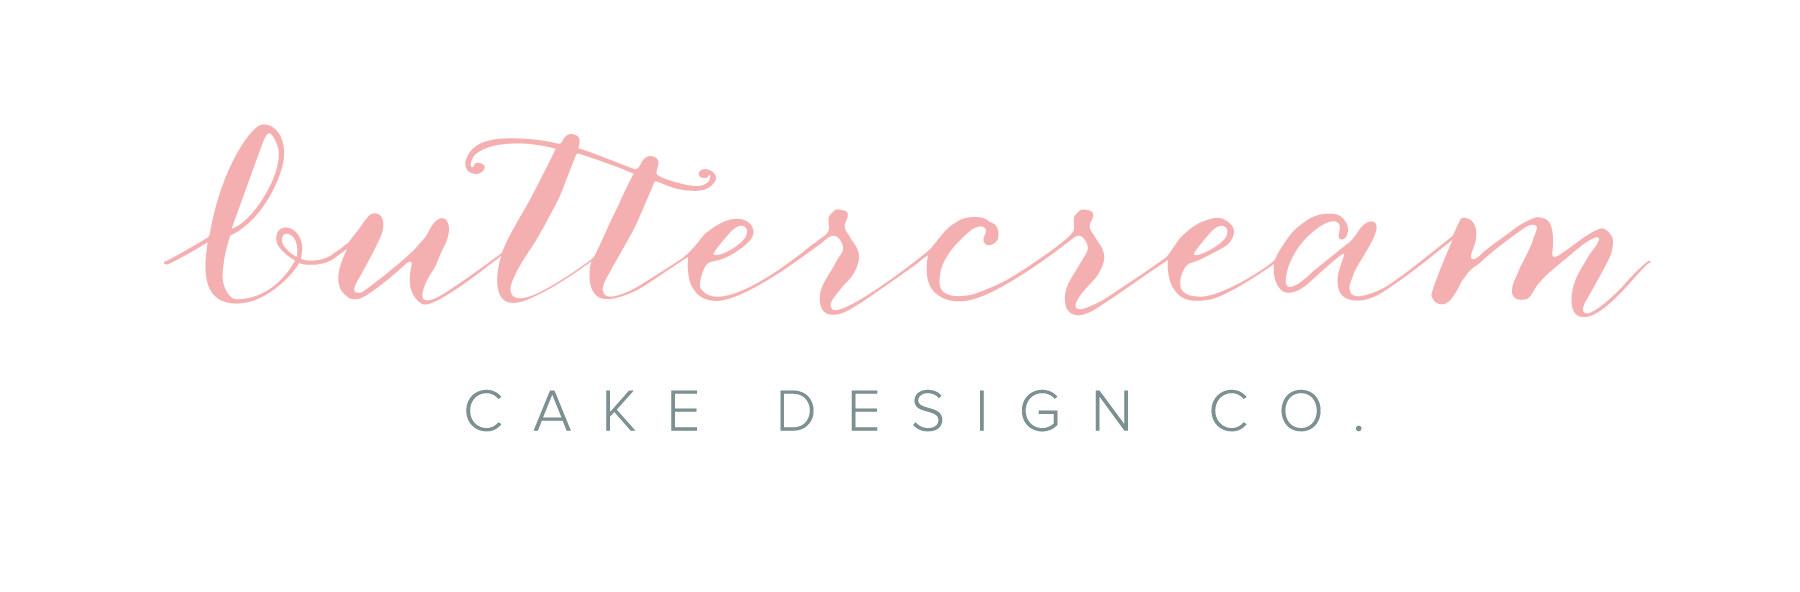 Buttercream Design Co.